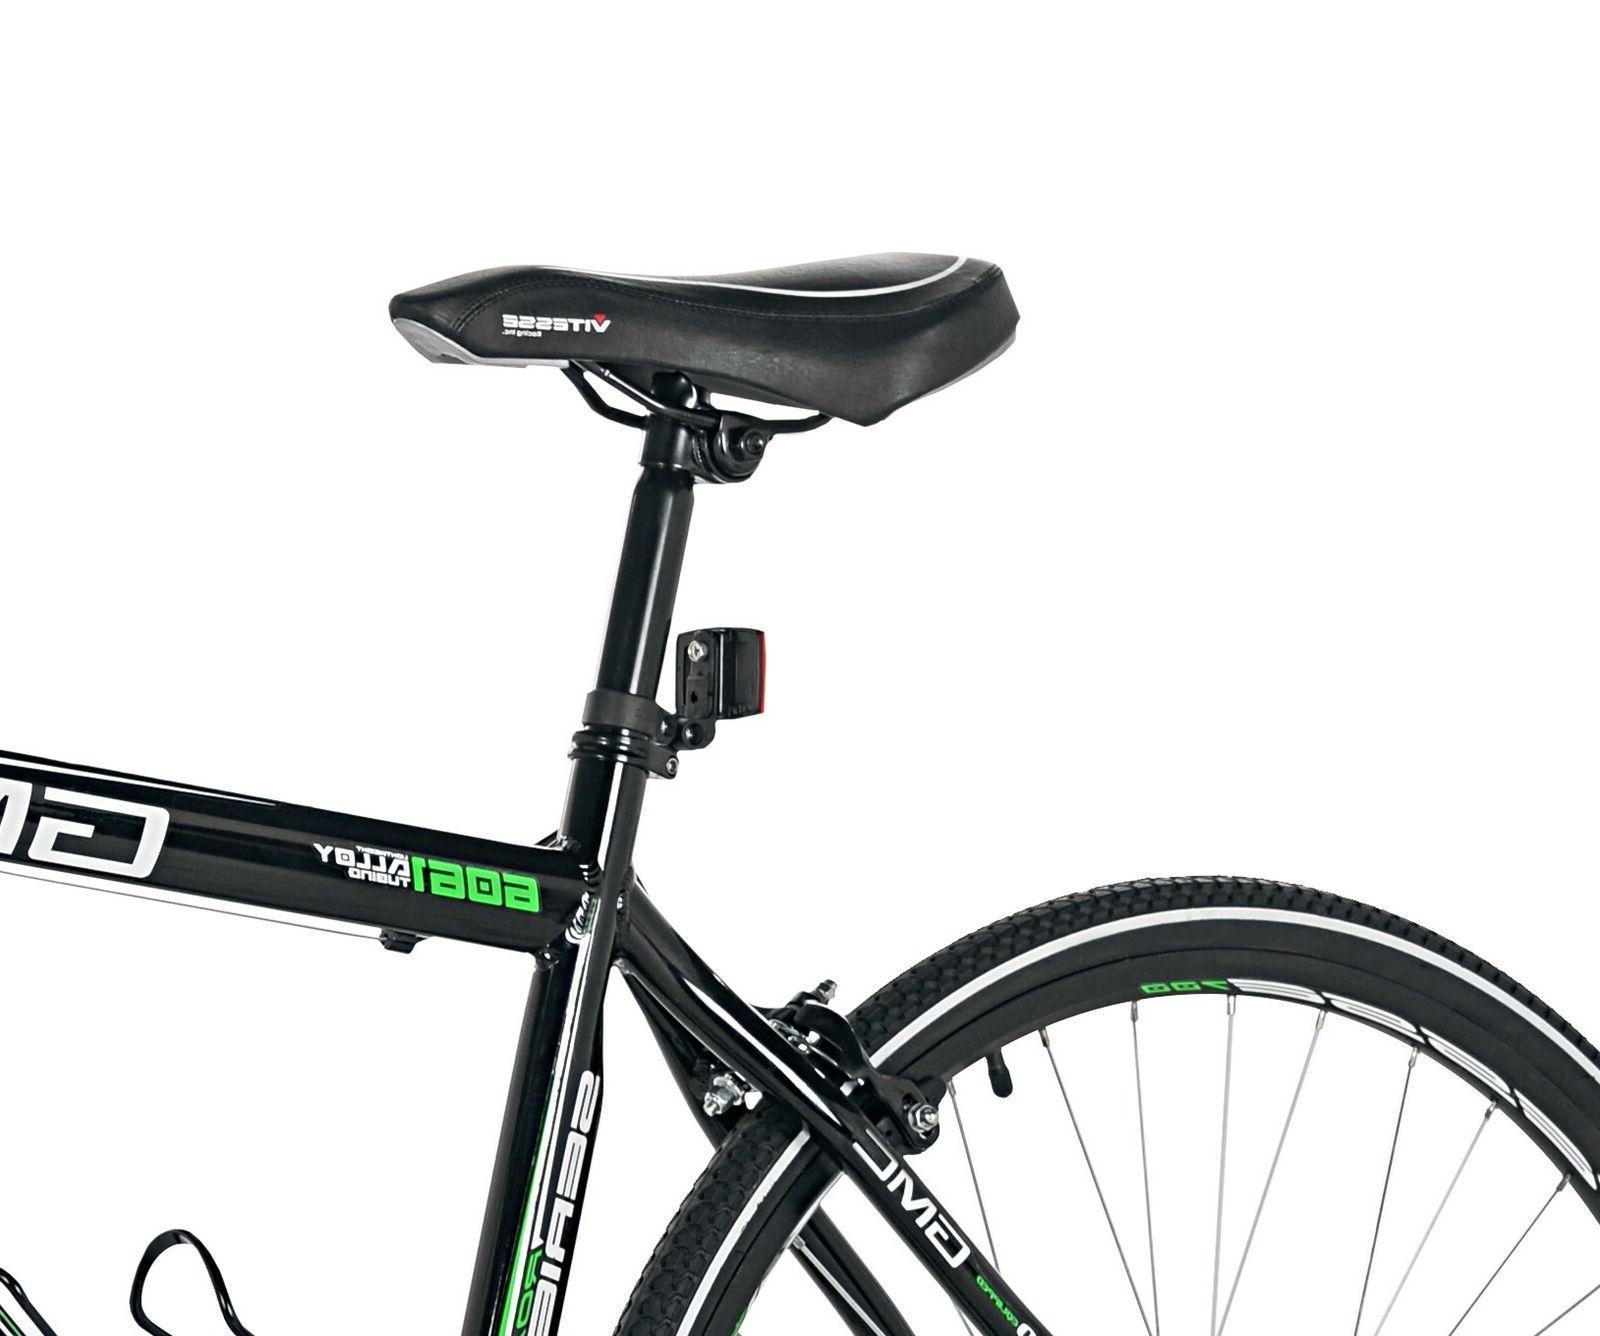 GMC 700c Denali Bicycle Black/Green DAY